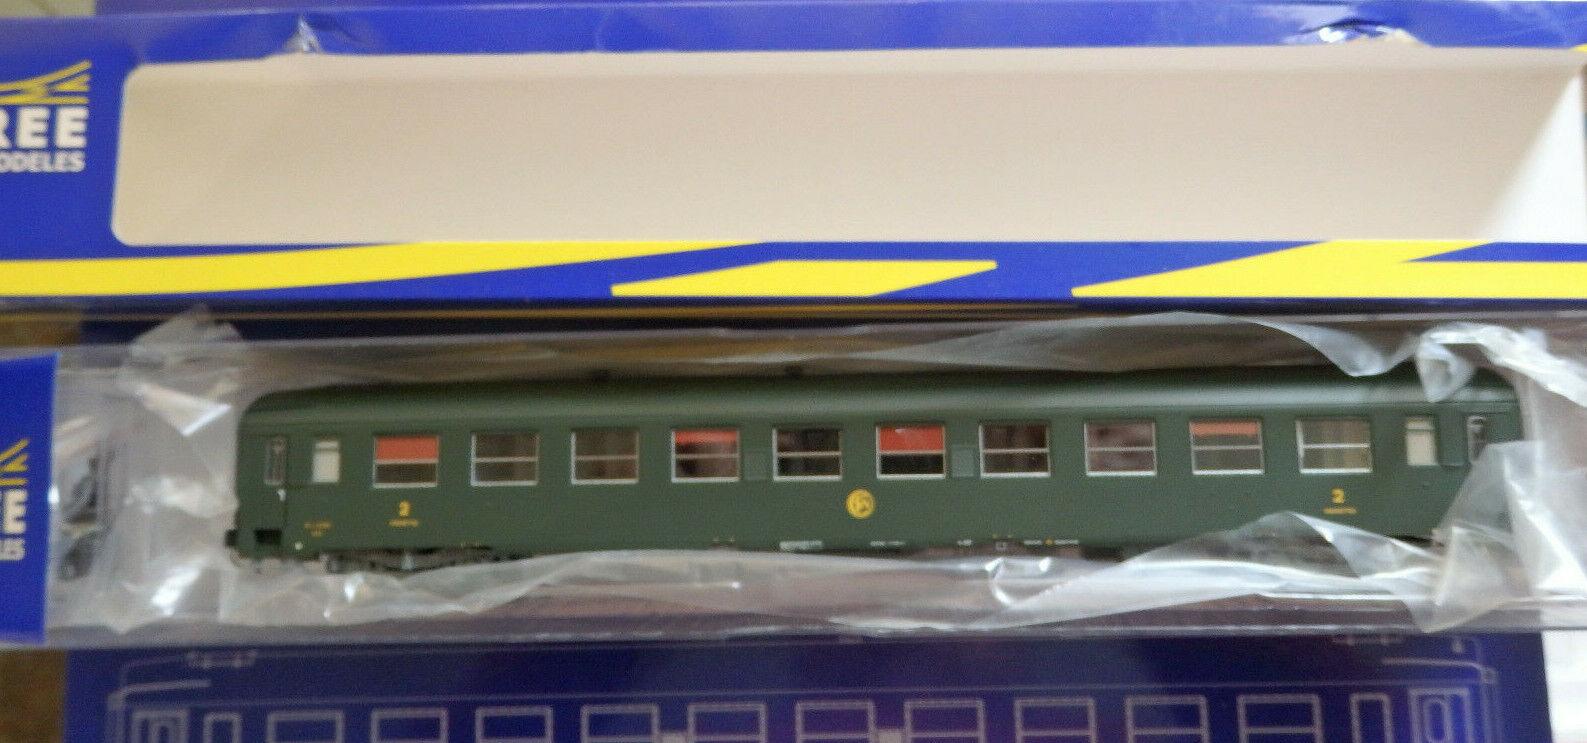 REE Modeles VB-171 CUCCETTE SNCF UIC-Y B9c9 livrea verde 301, telaio grigio, log